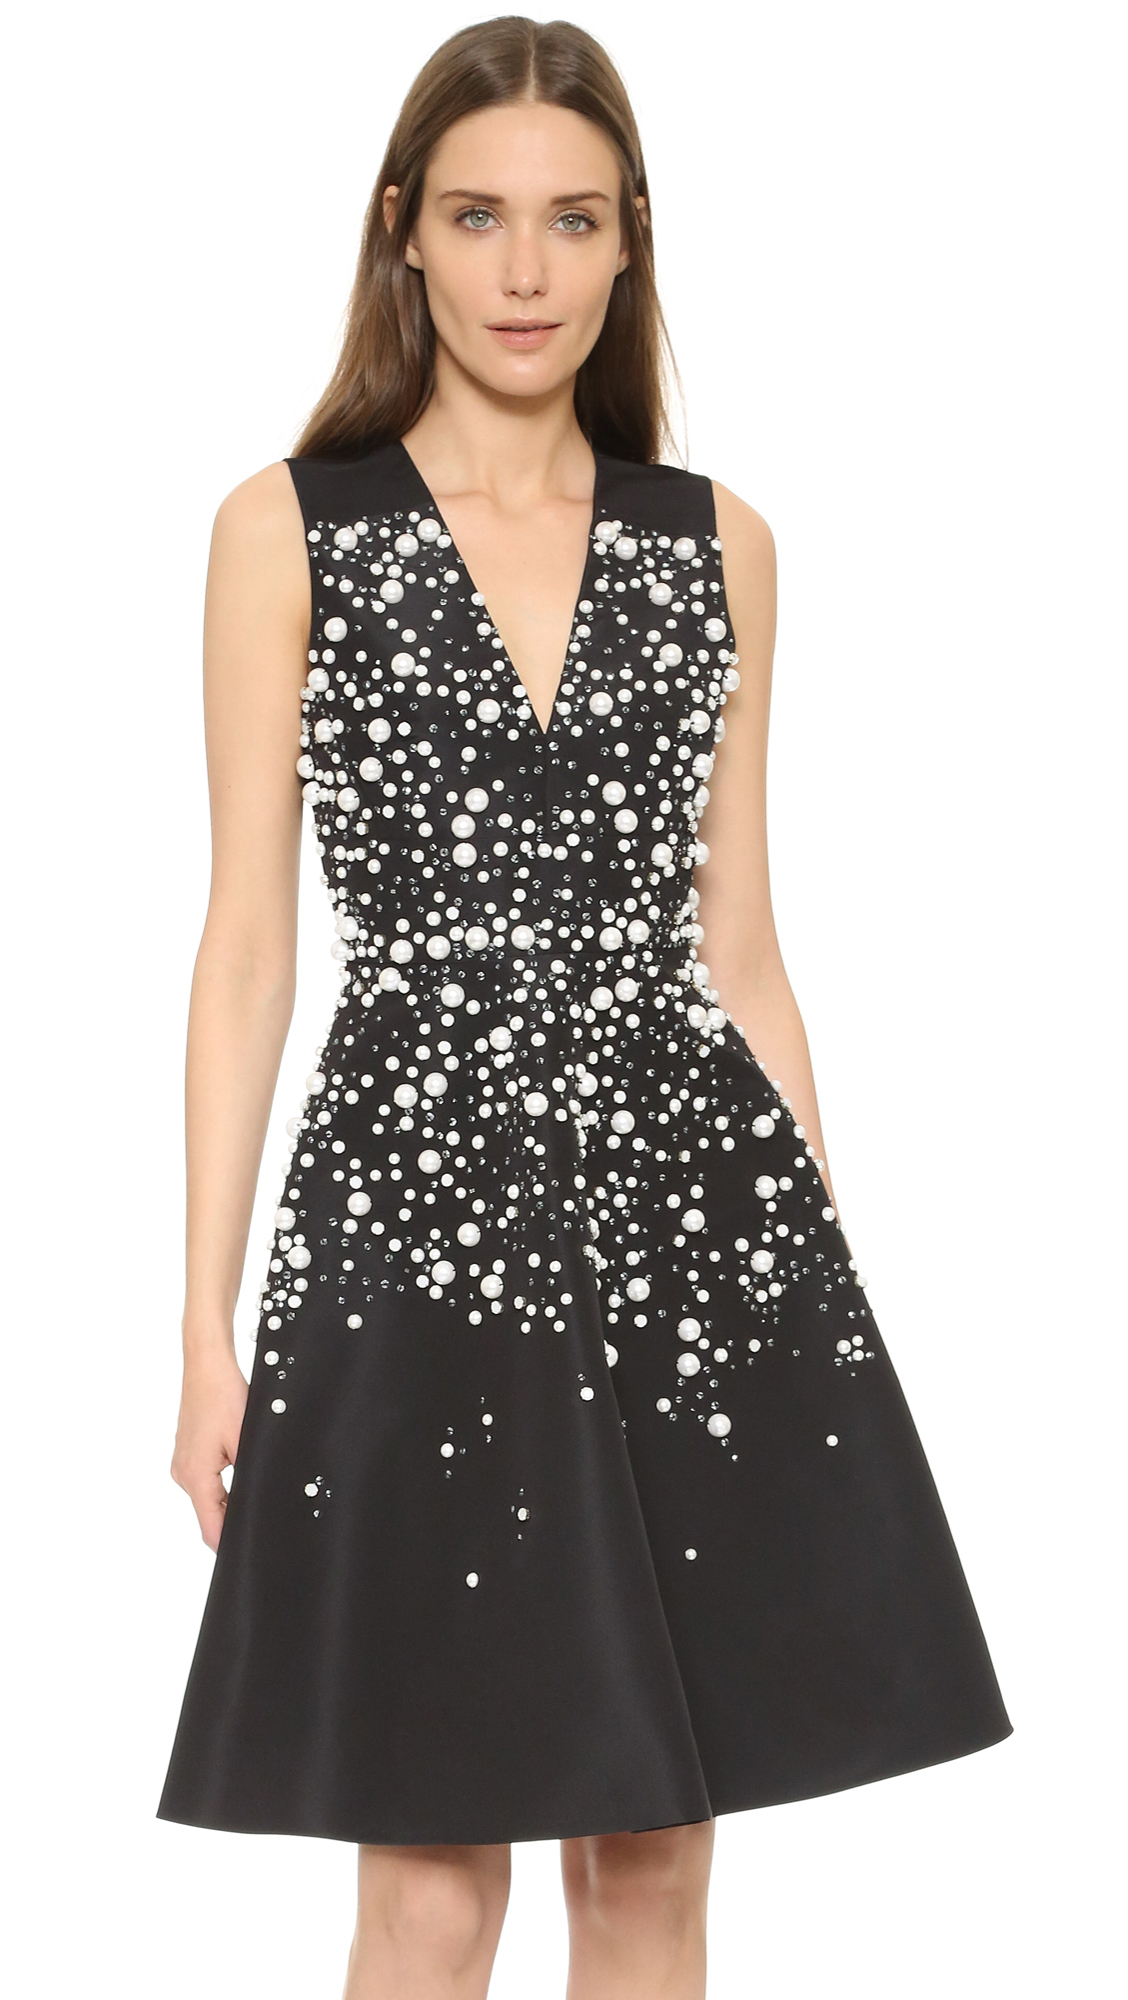 Prabal gurung Sleeveless Dress in Black | Lyst